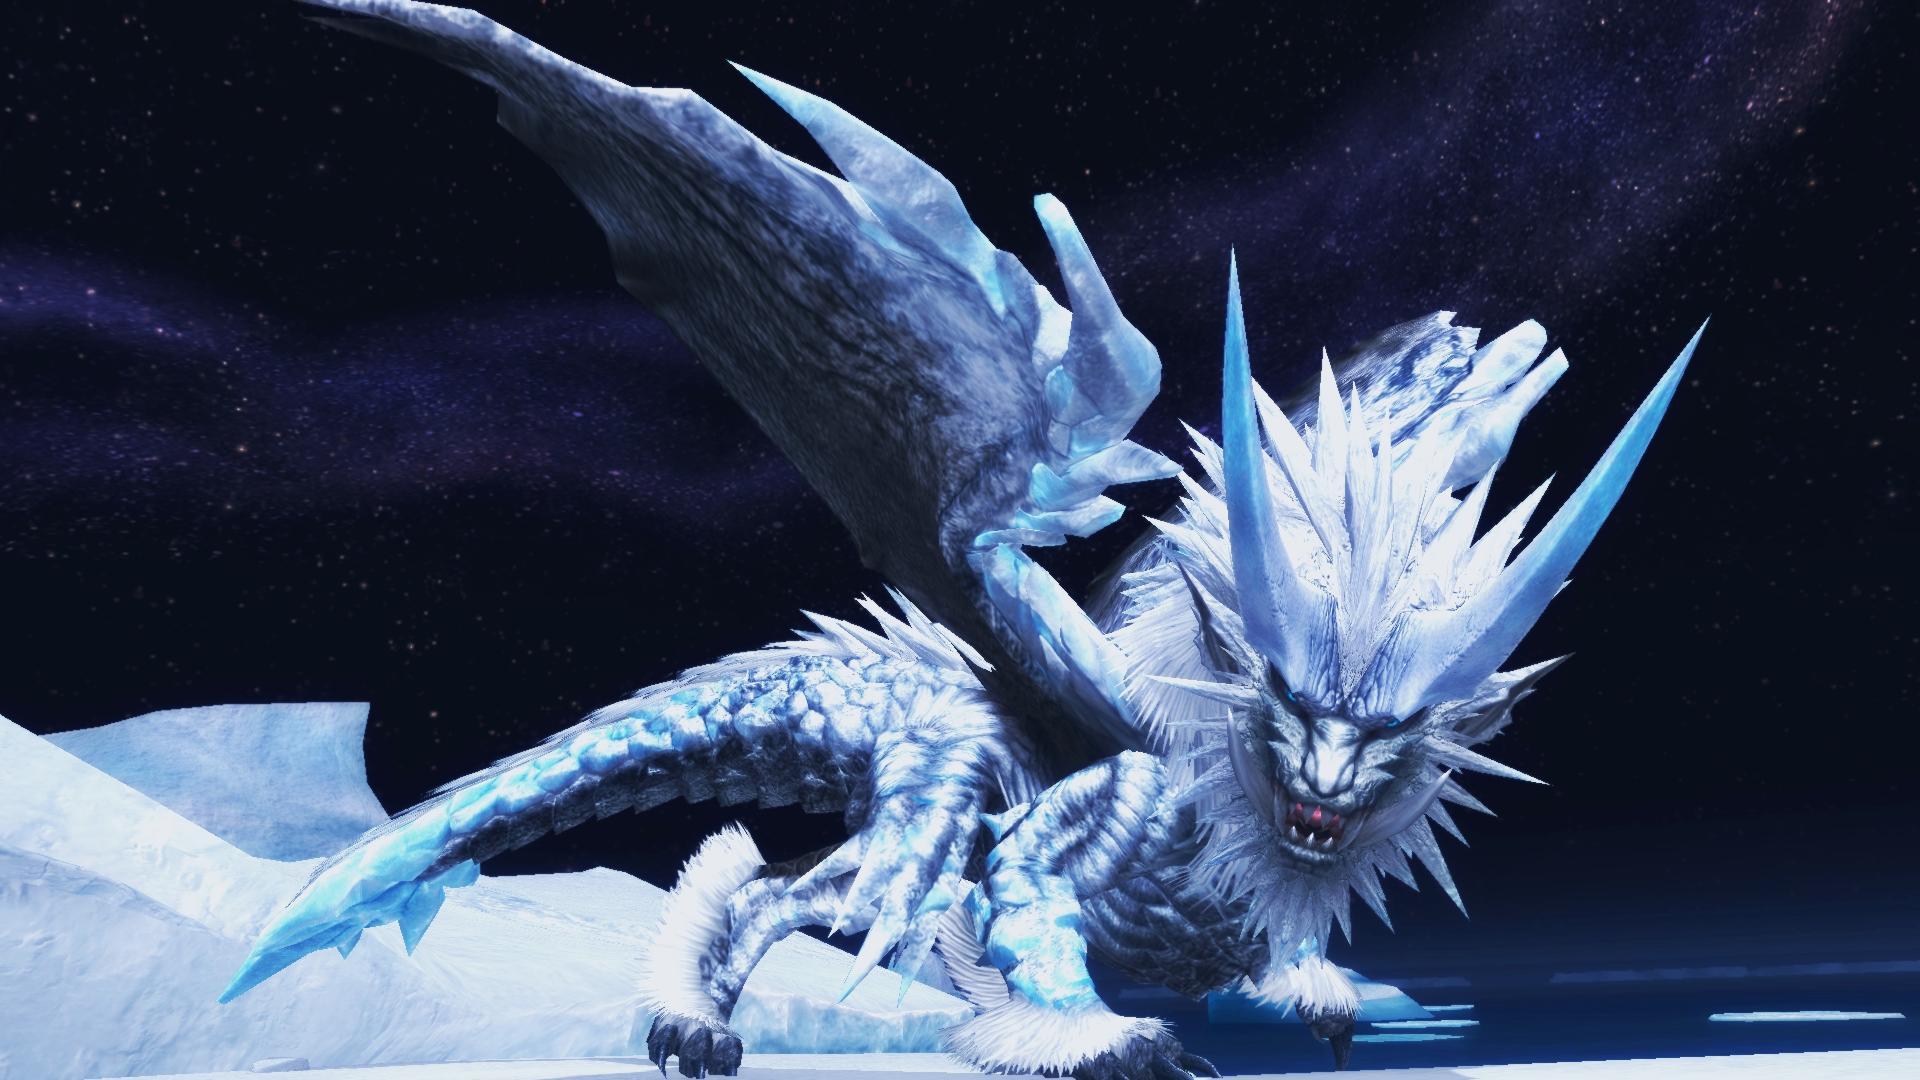 Toa Tesukatora Monster Hunter Wiki Fandom Powered By Wikia